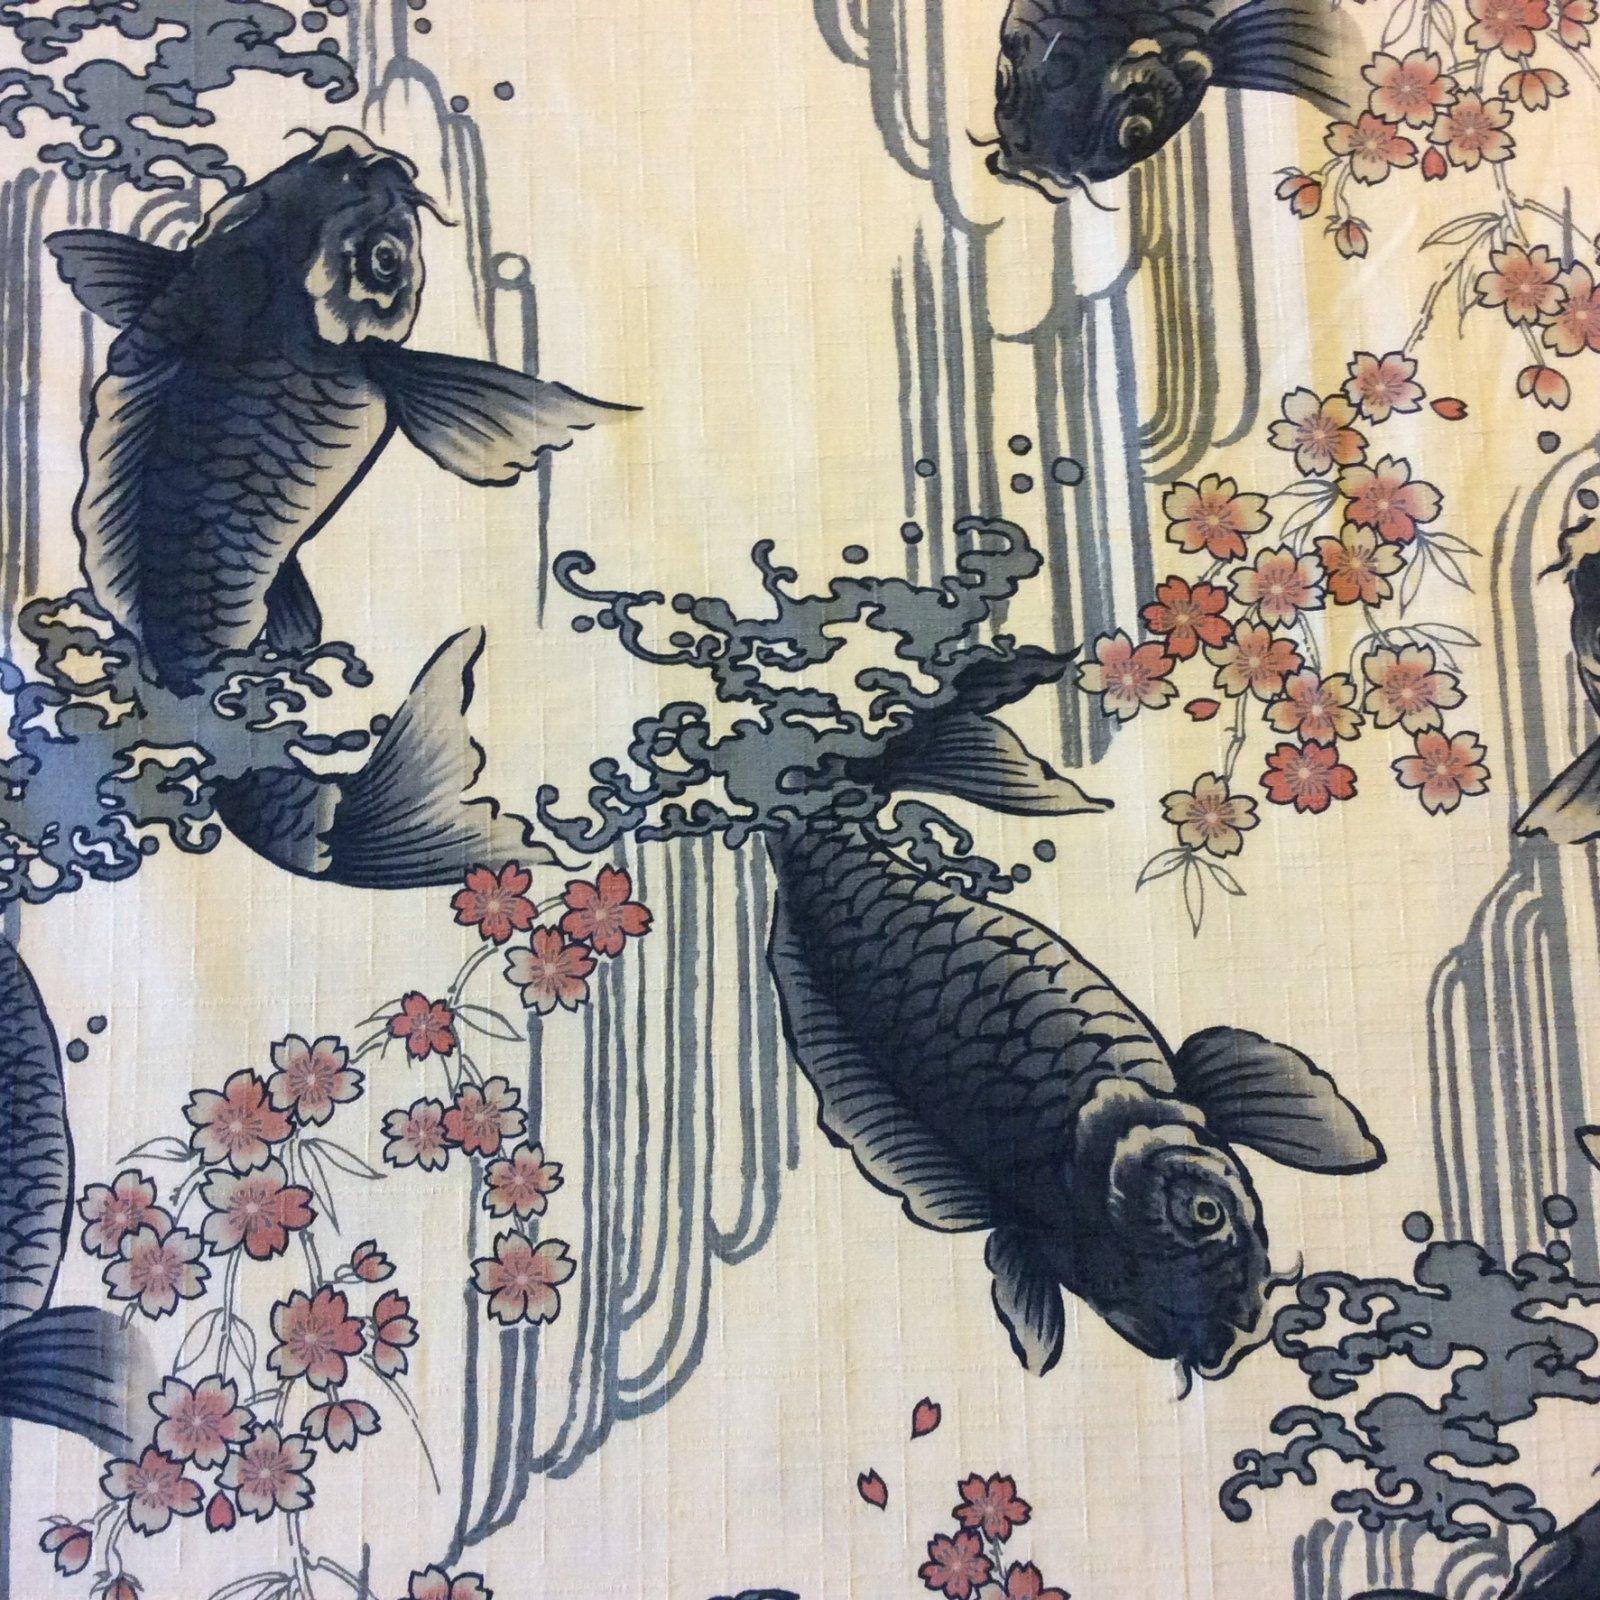 ek49 Japanese Asian Dobby  Koi Fish Waterfall Dobby Textured Cotton Fabric EK49